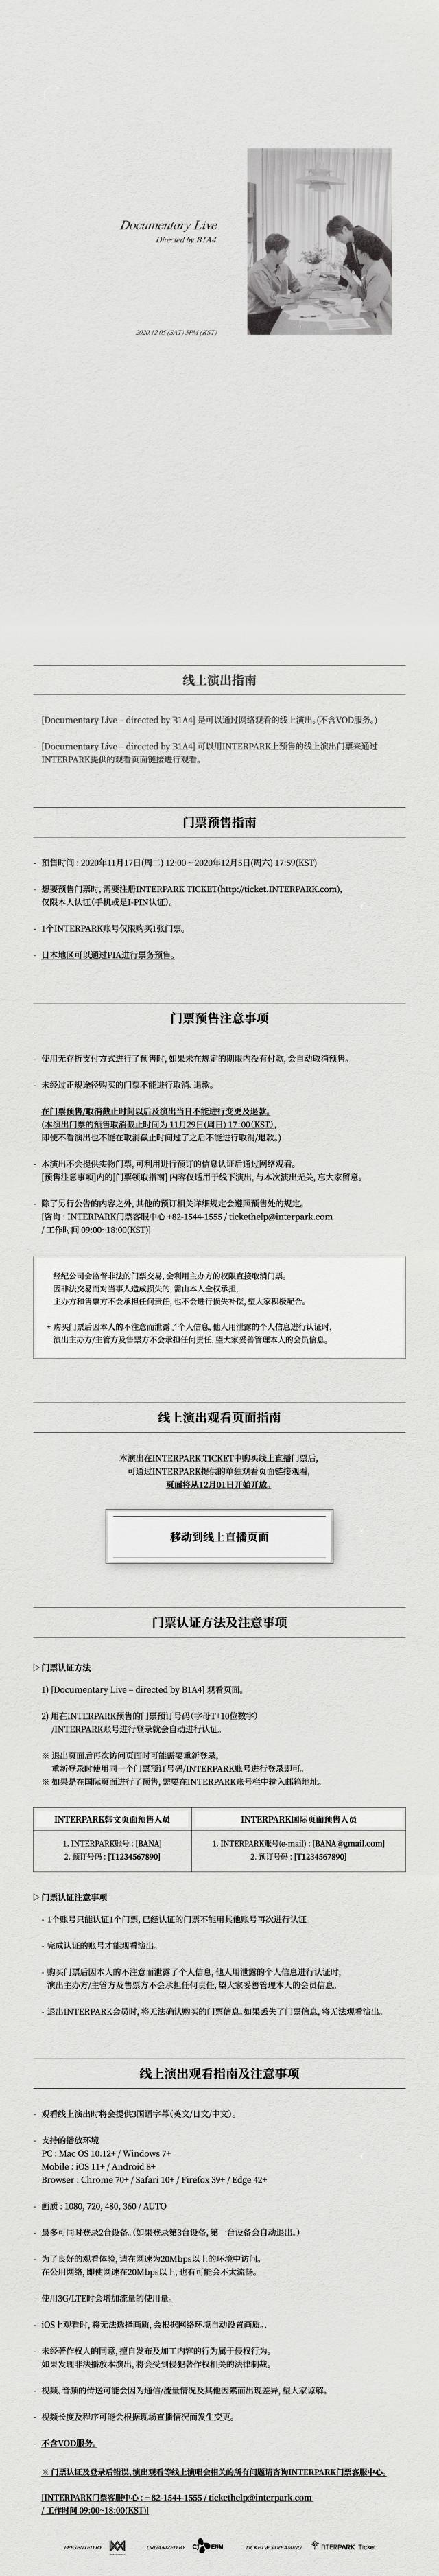 B1A4_CONCERT_TICKET_PAGE_CHN.jpg